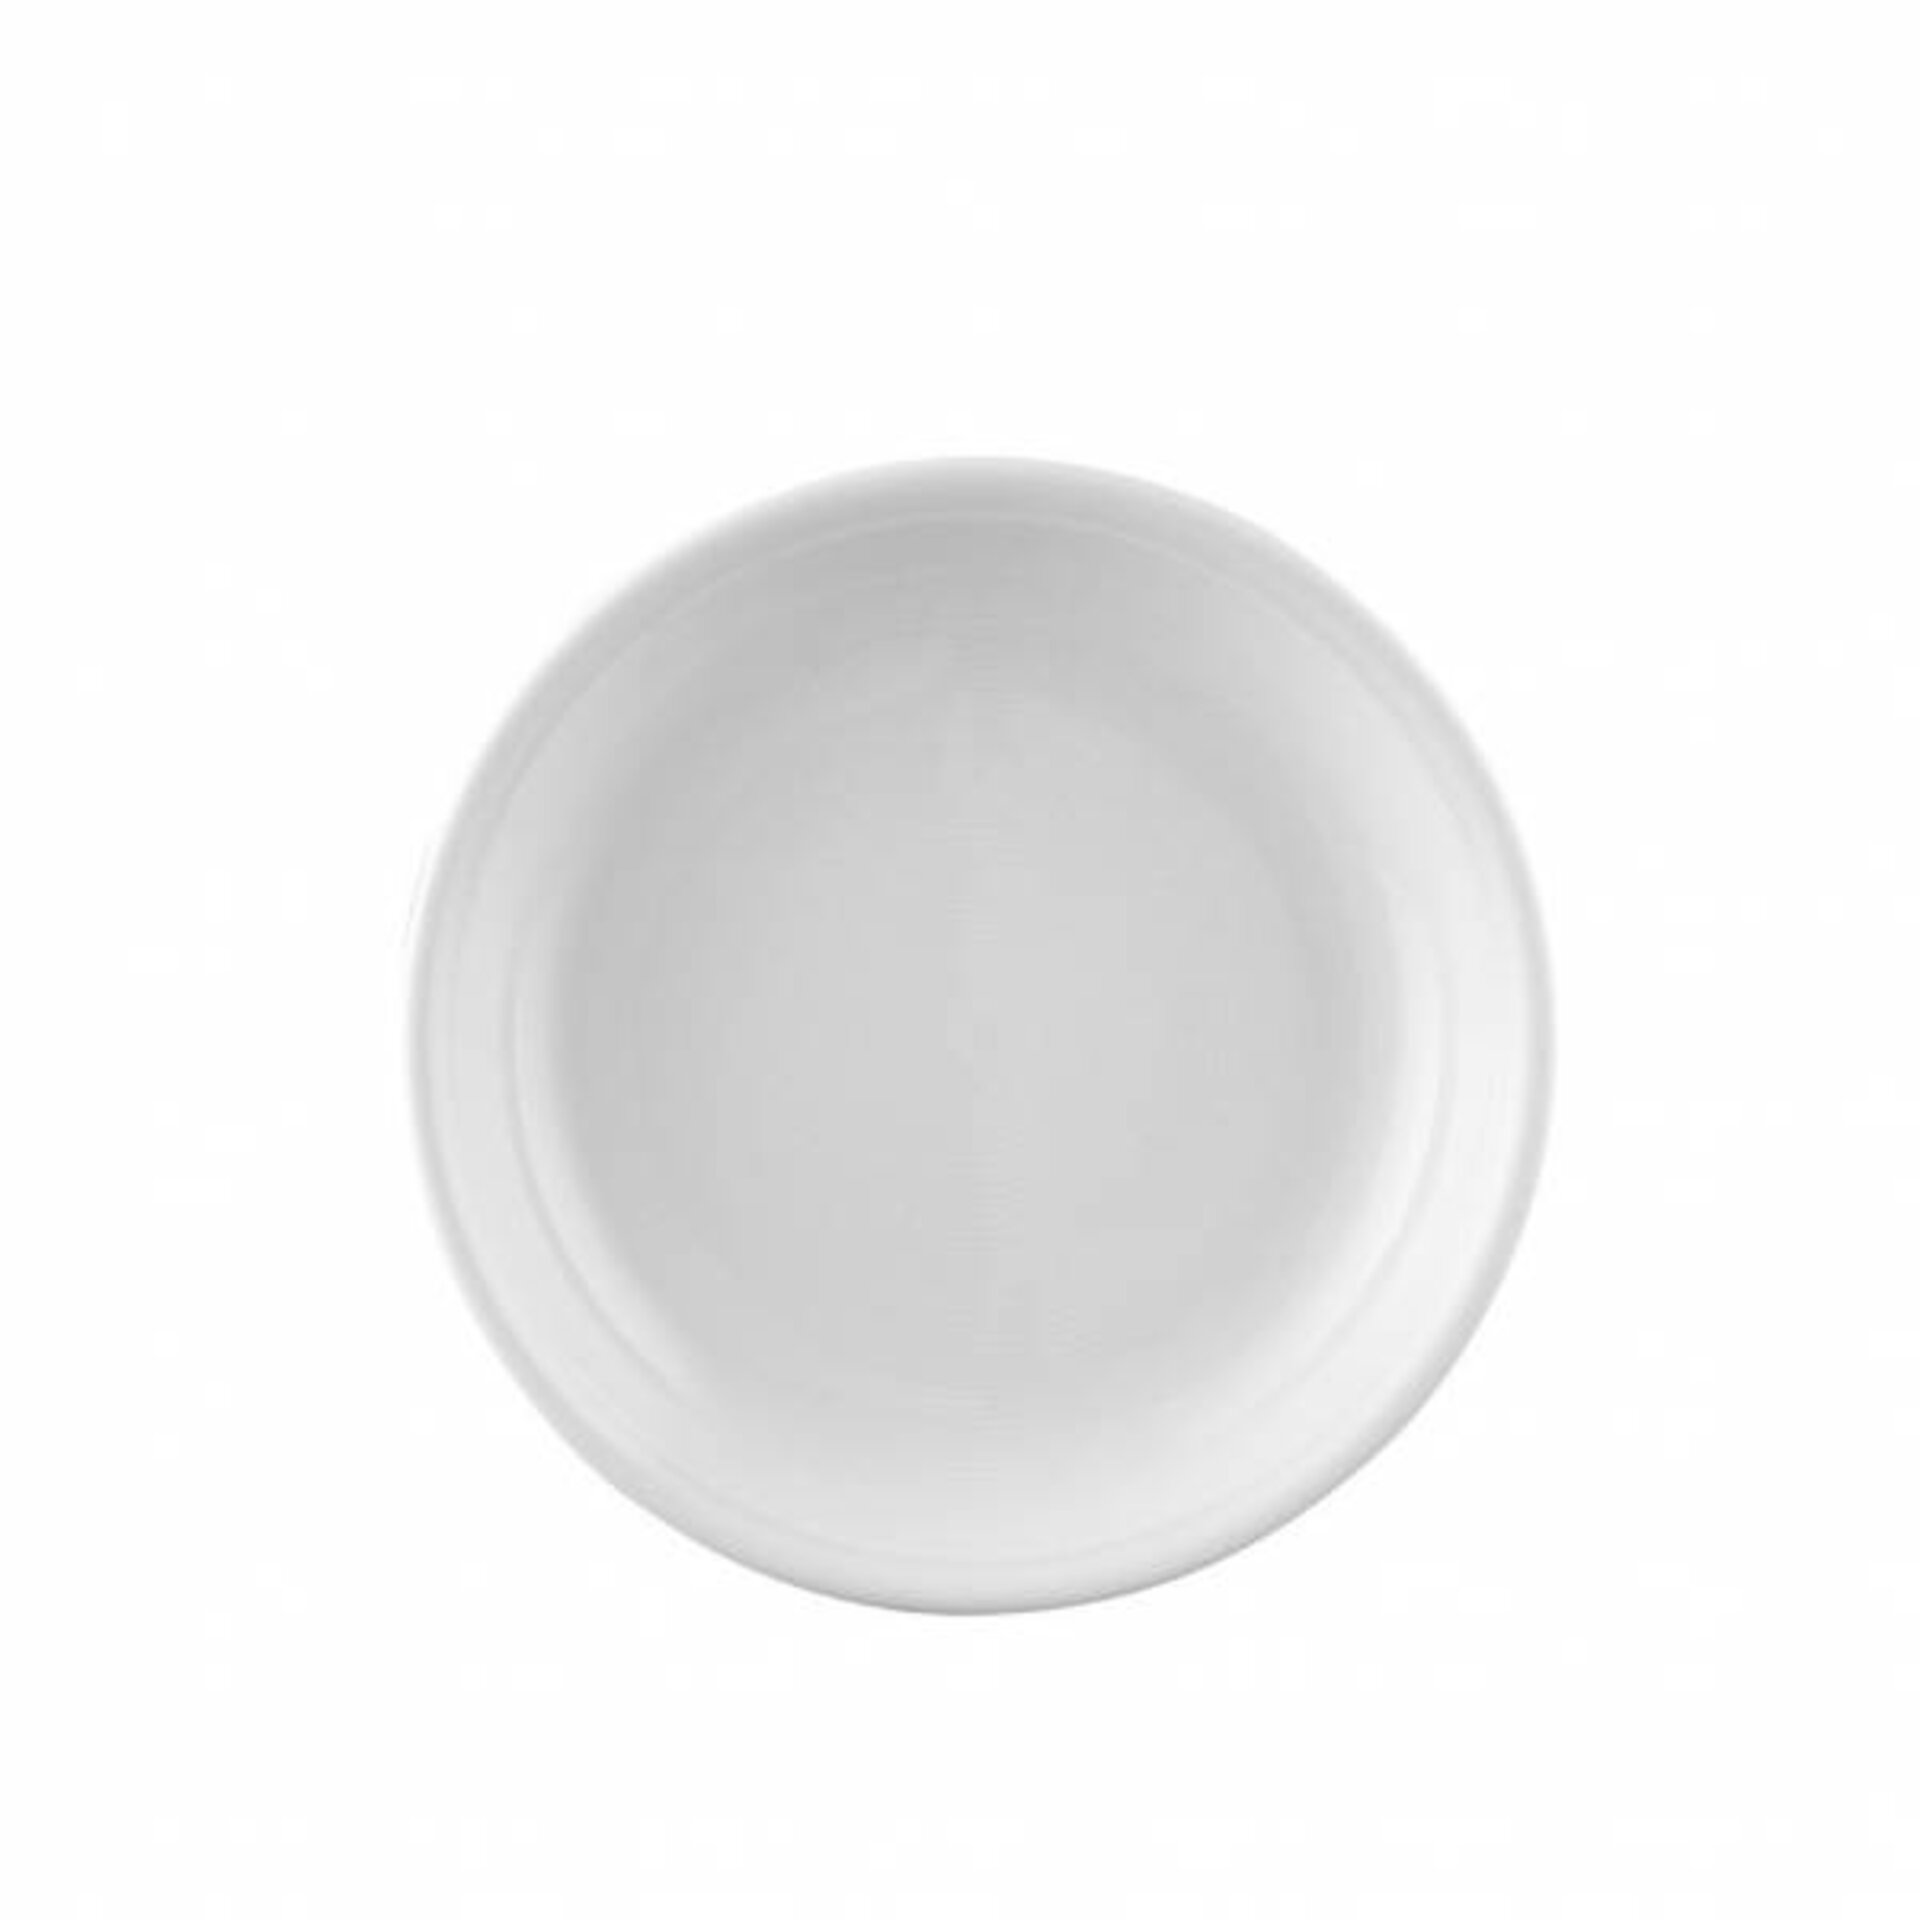 Geschirr Trend Thomas Keramik grau